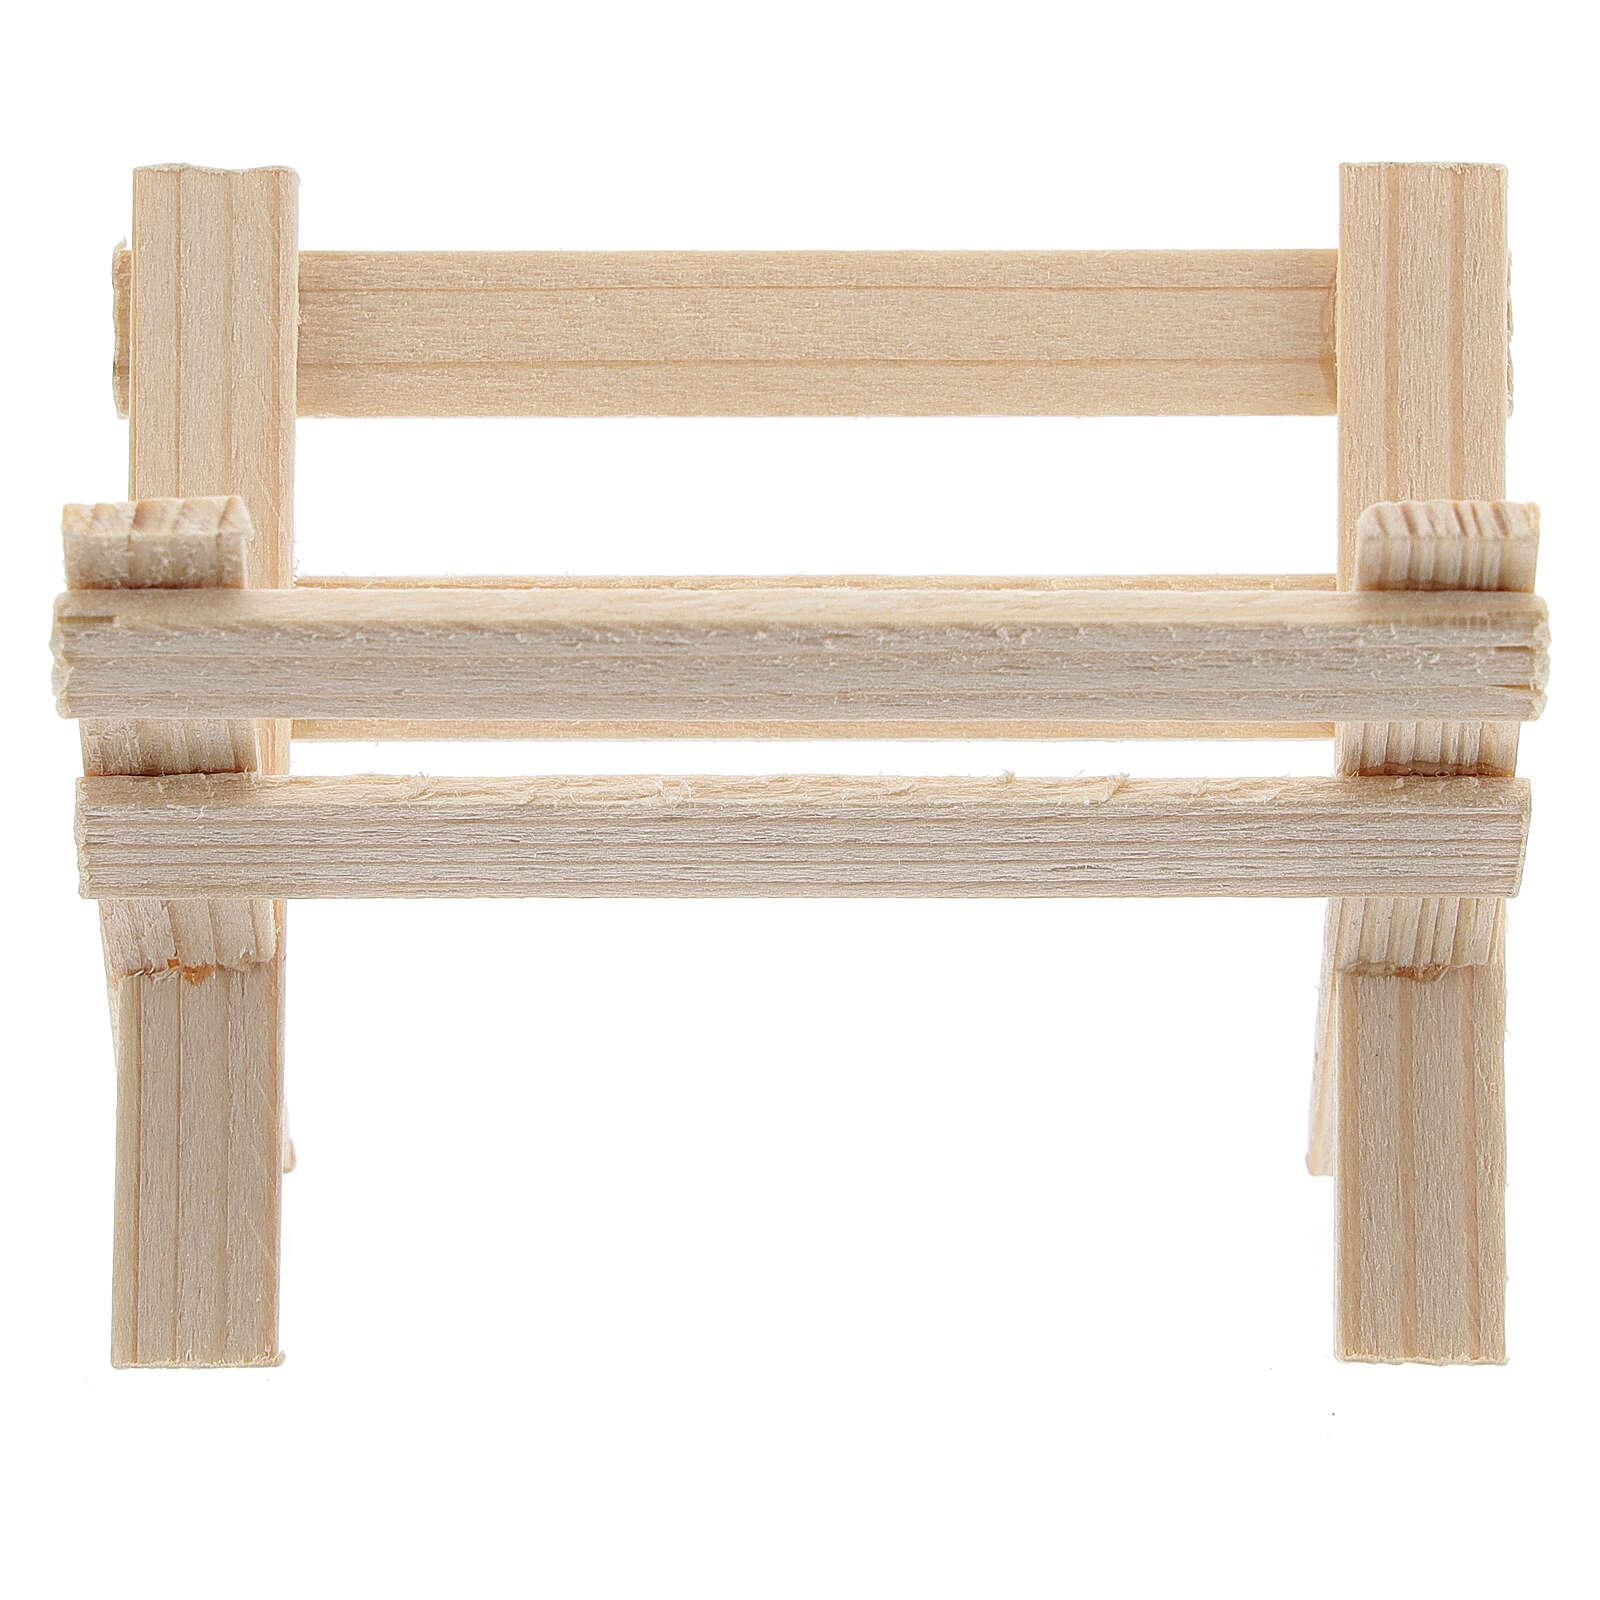 Mangiatoia vuota legno presepe 8 cm 4